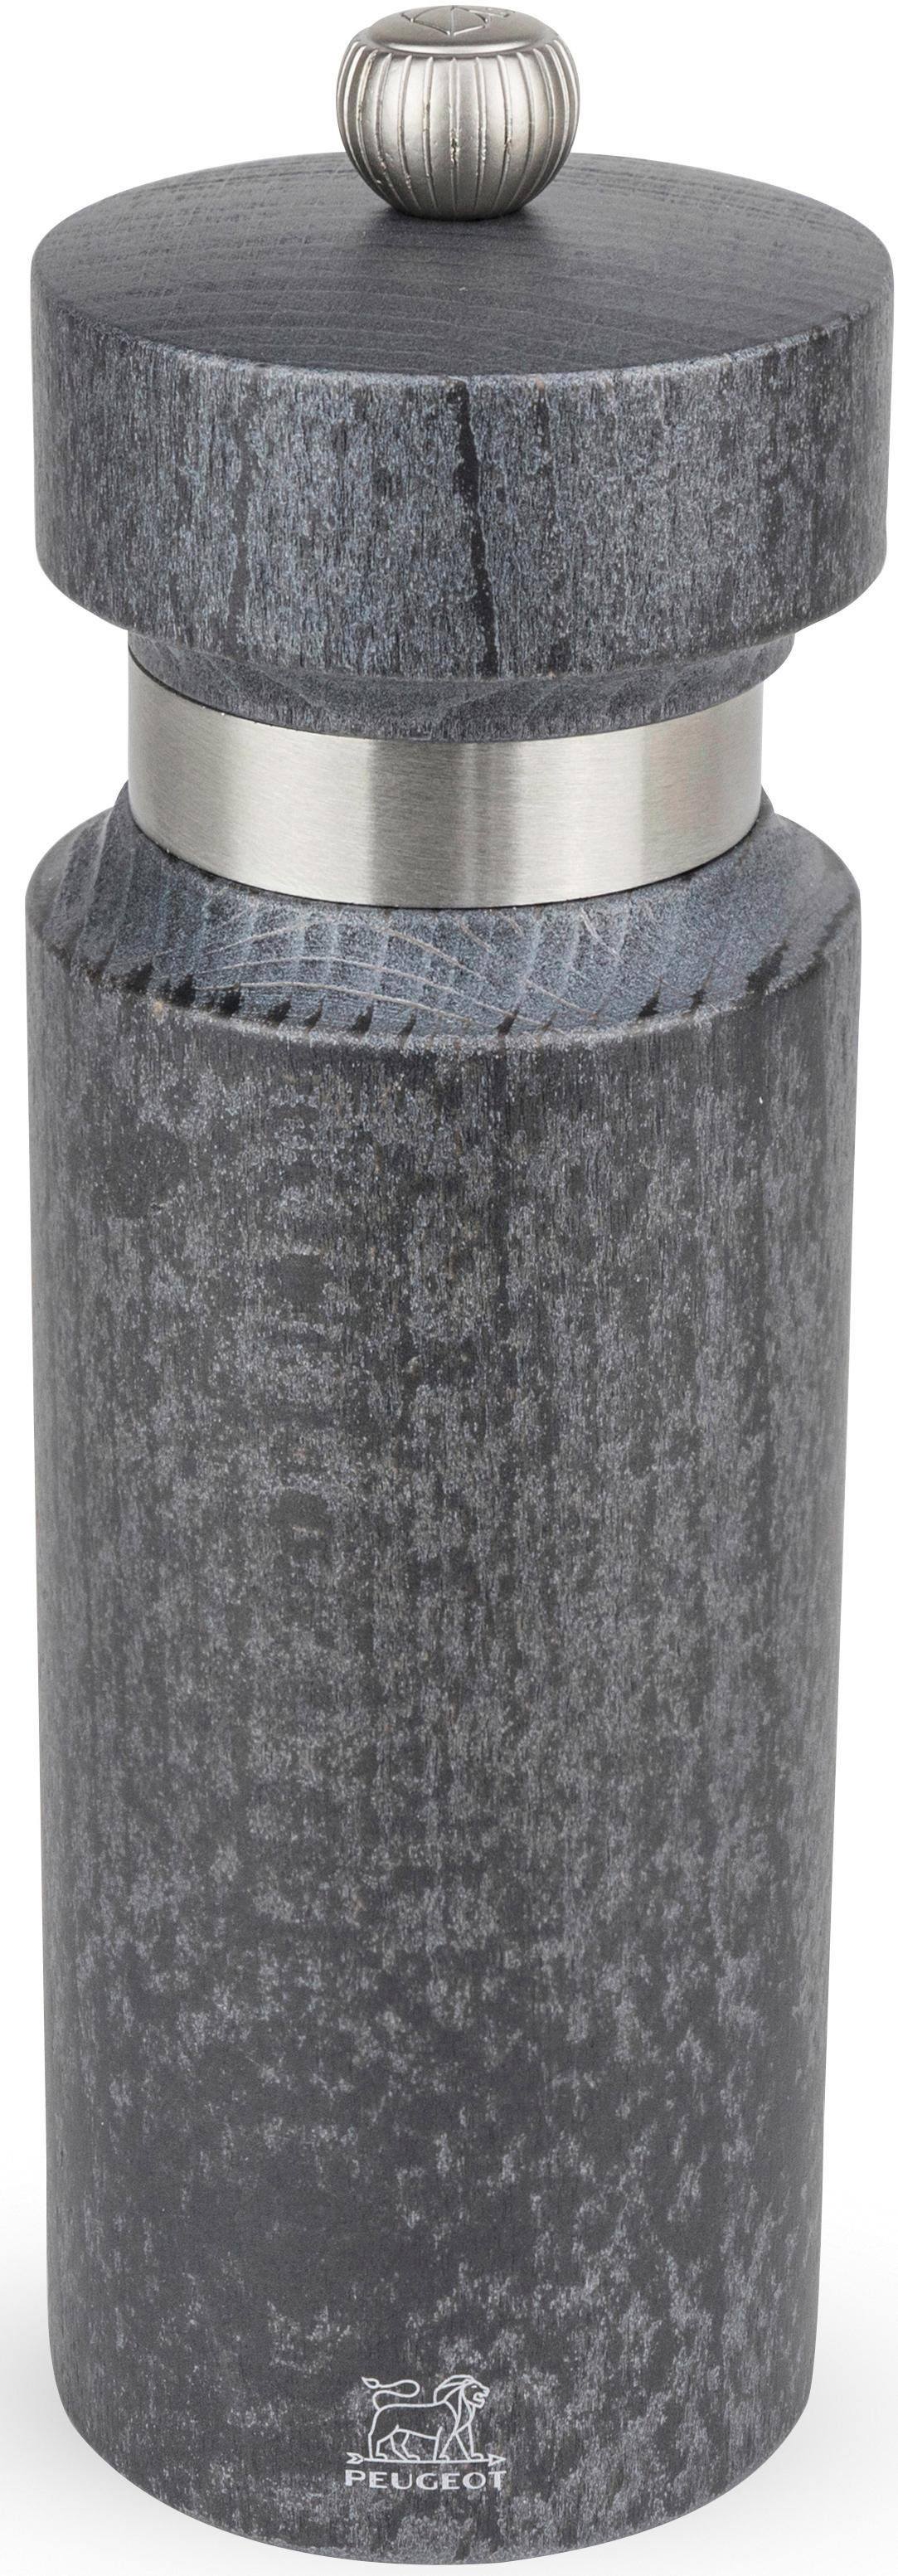 PEUGEOT Salzmühle »Royan« manuell, ohne Mittelachse, 18 cm